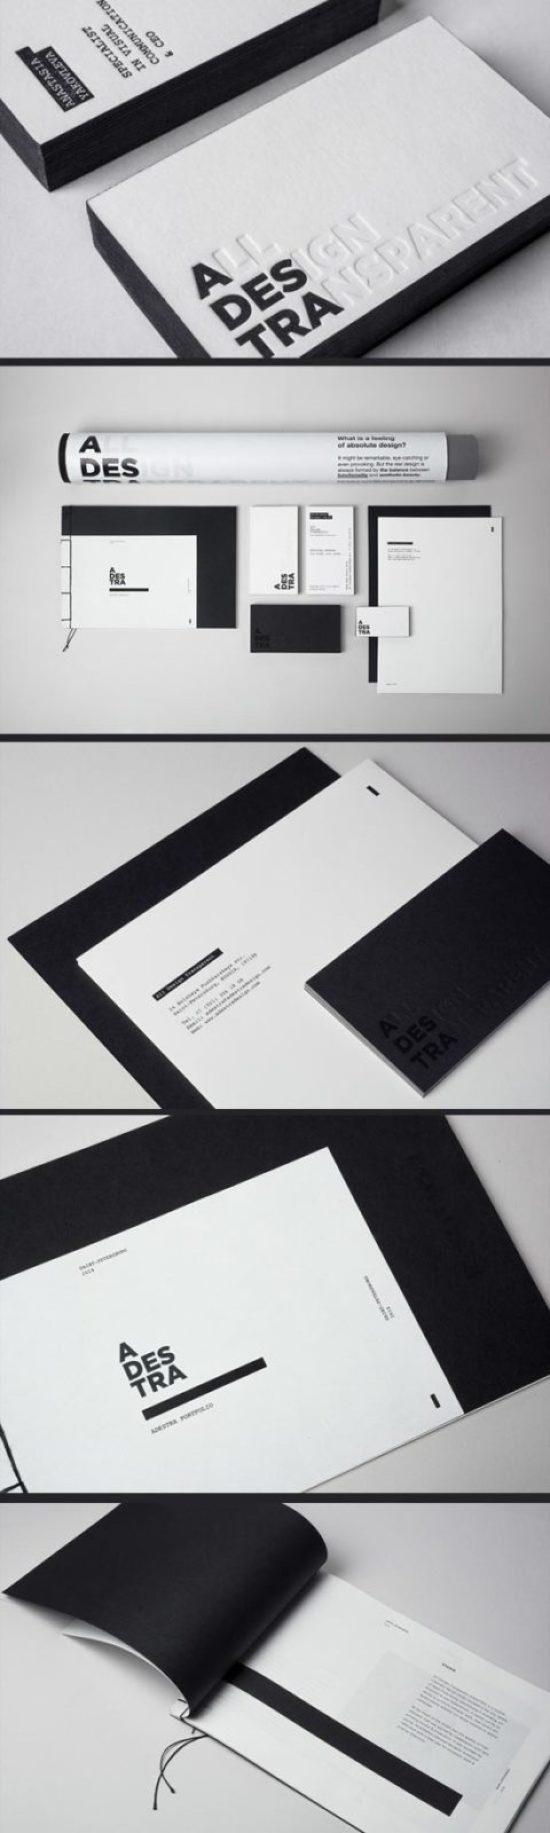 branding-adestra